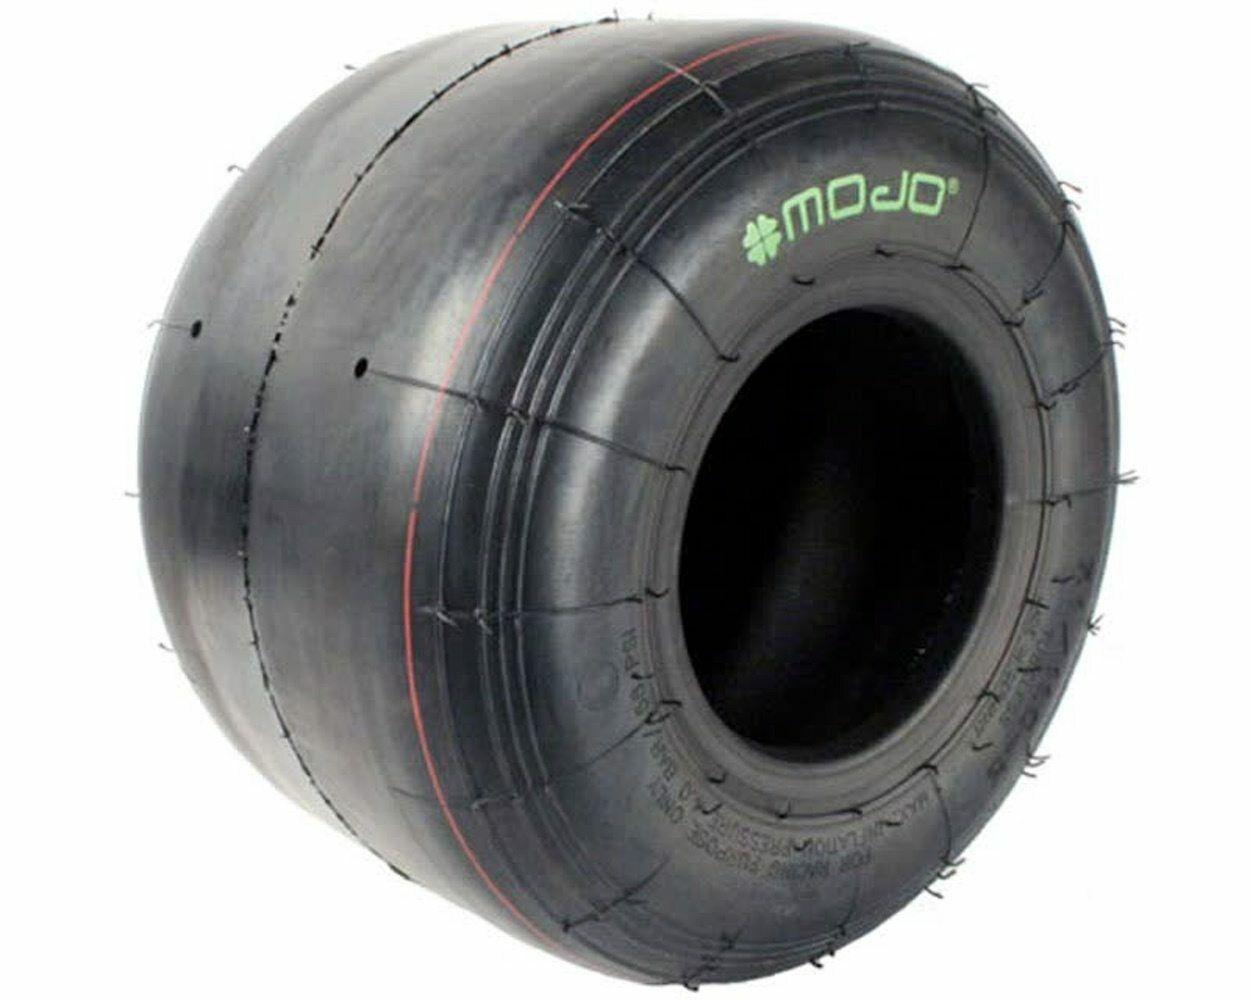 s l1600 - Ir Kart Mojo D2 Neumático Rotax Max Menor / Mayor Karting Raza Racing